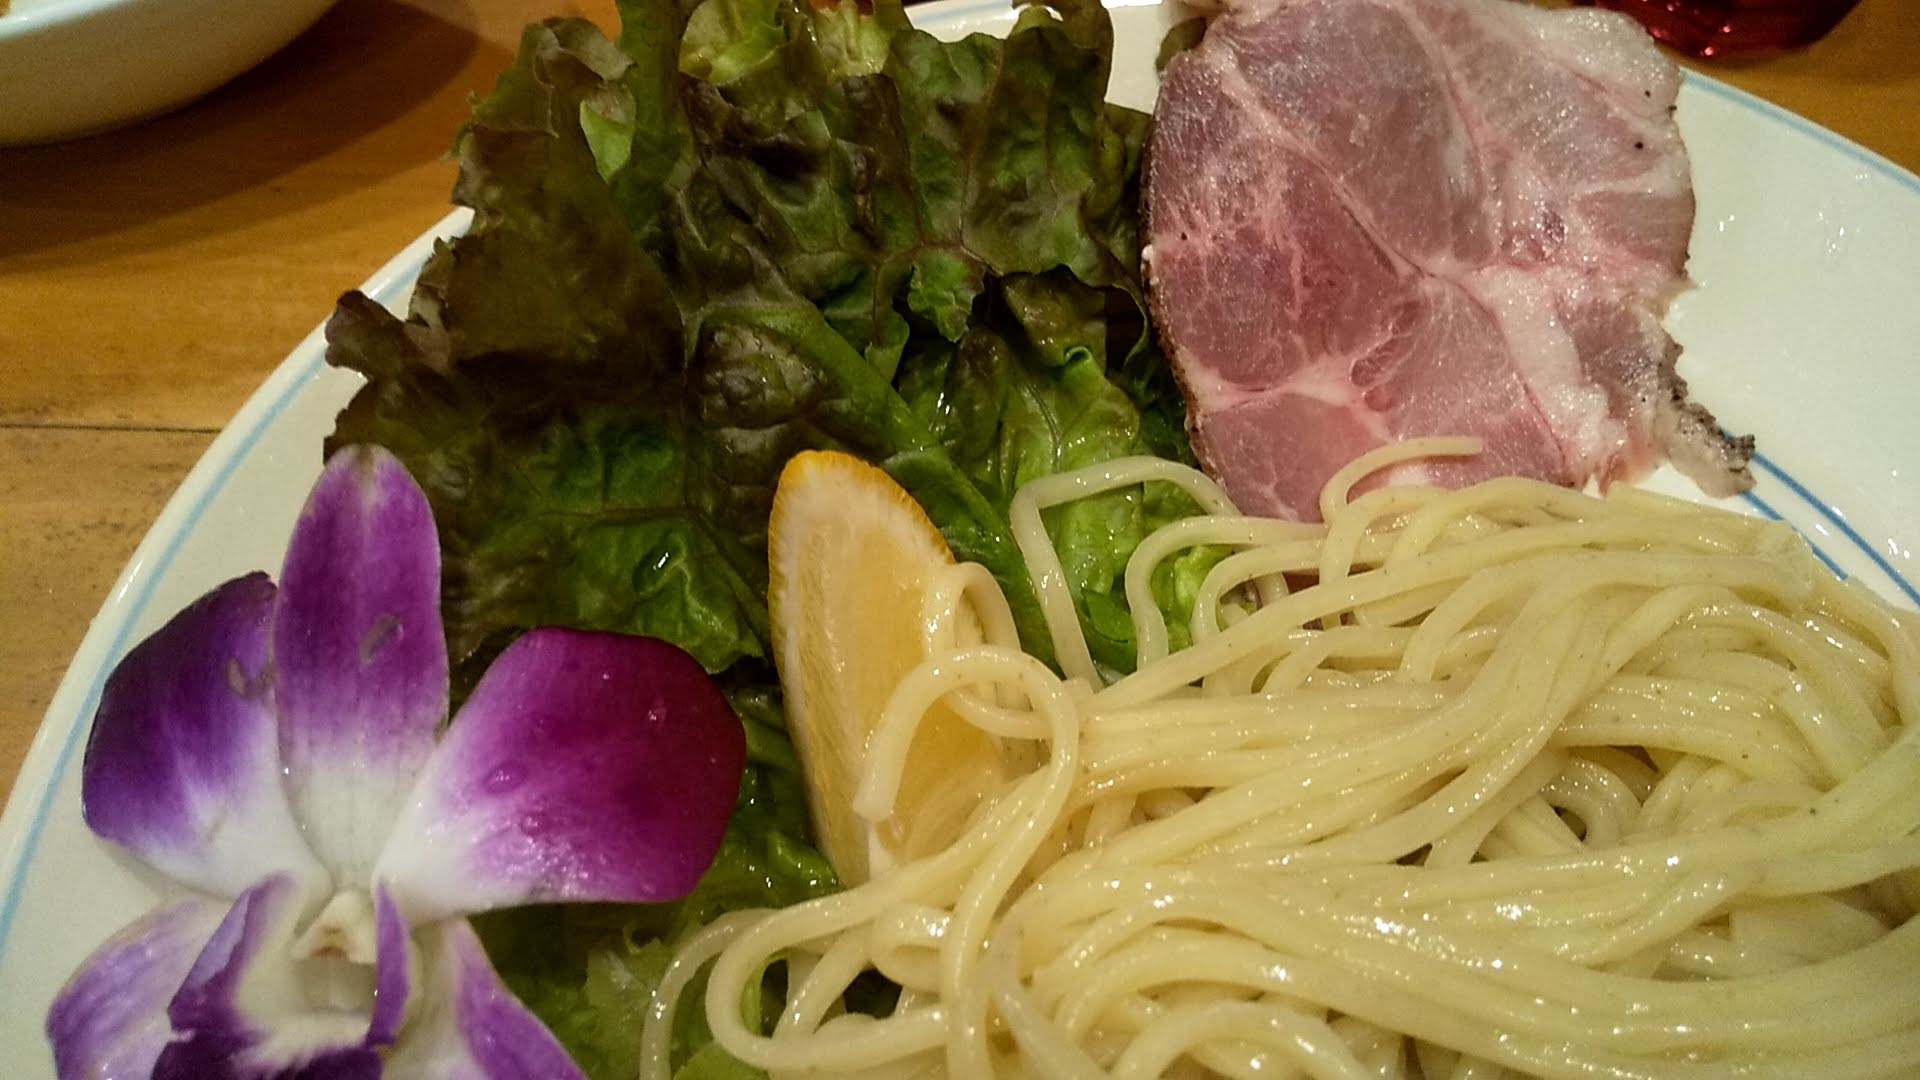 Hulu-luのつけ麺の麺皿アップ